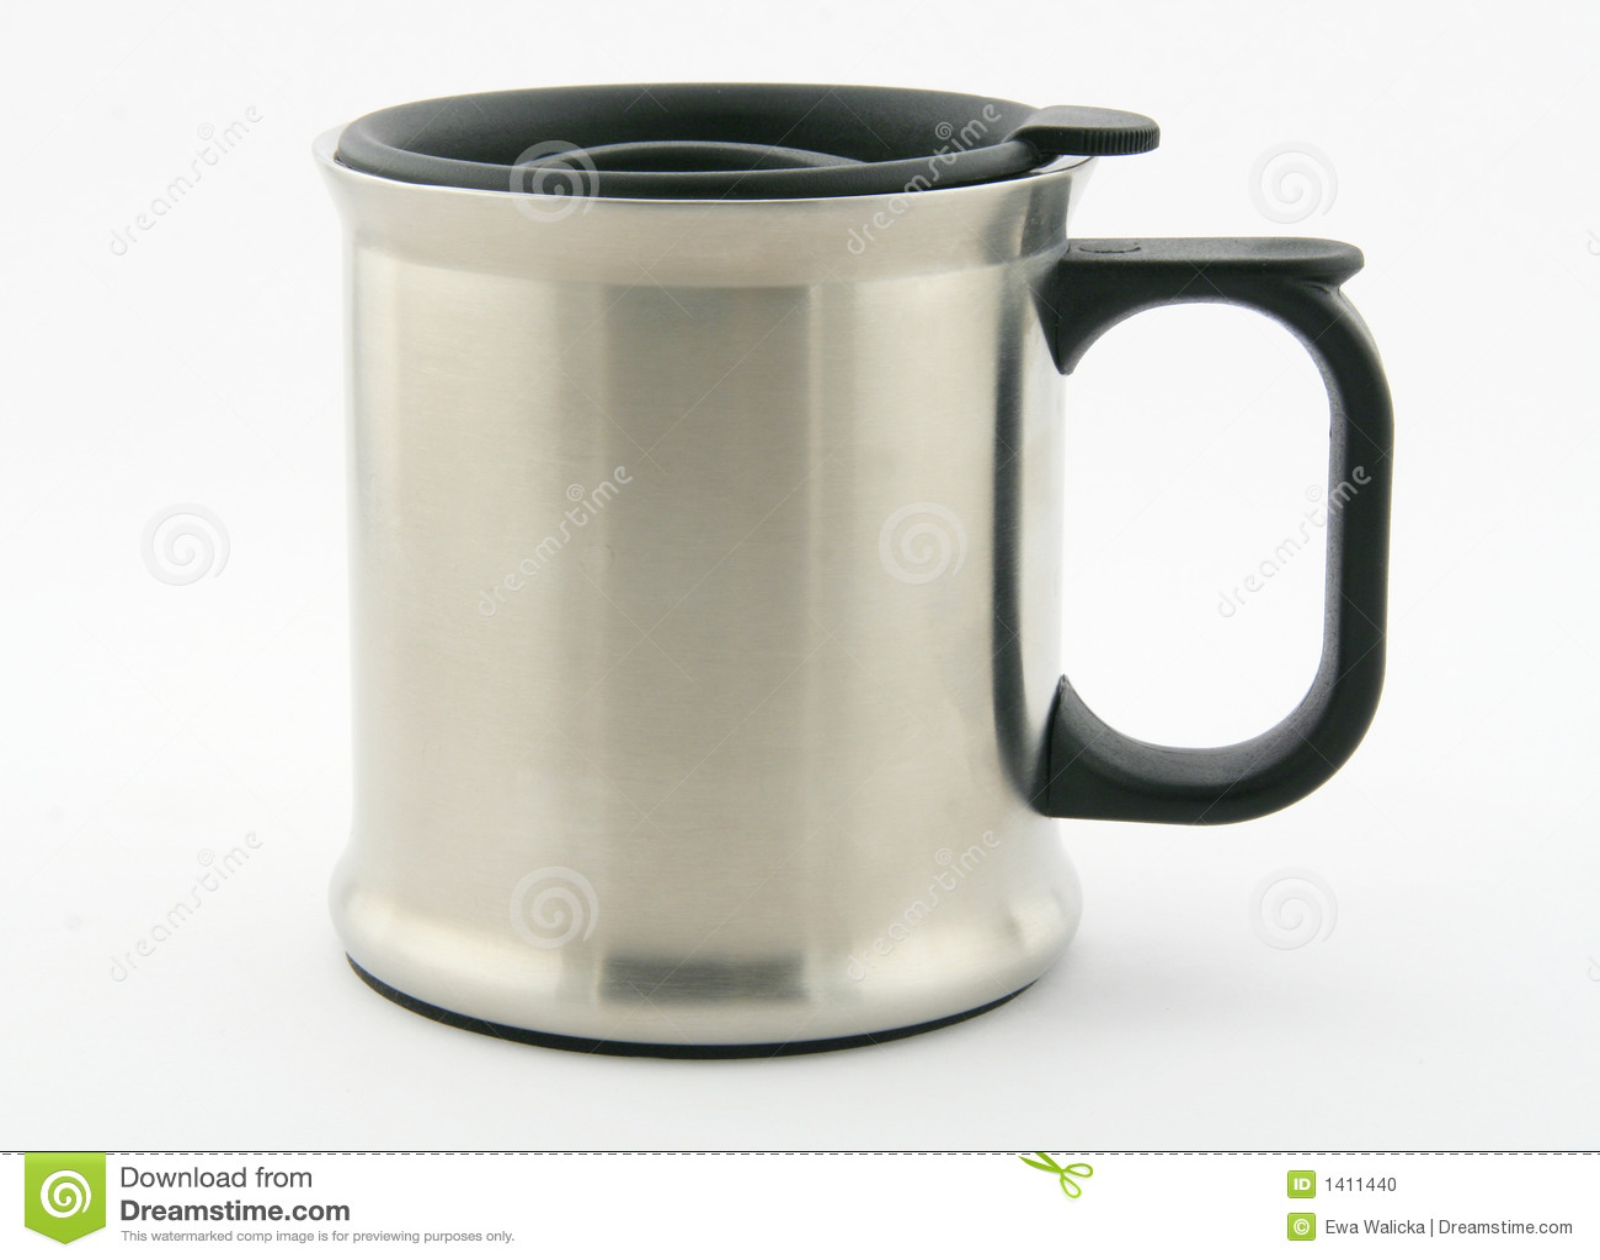 Thermos Mug Stock Photo Image Of Outdoor Metal